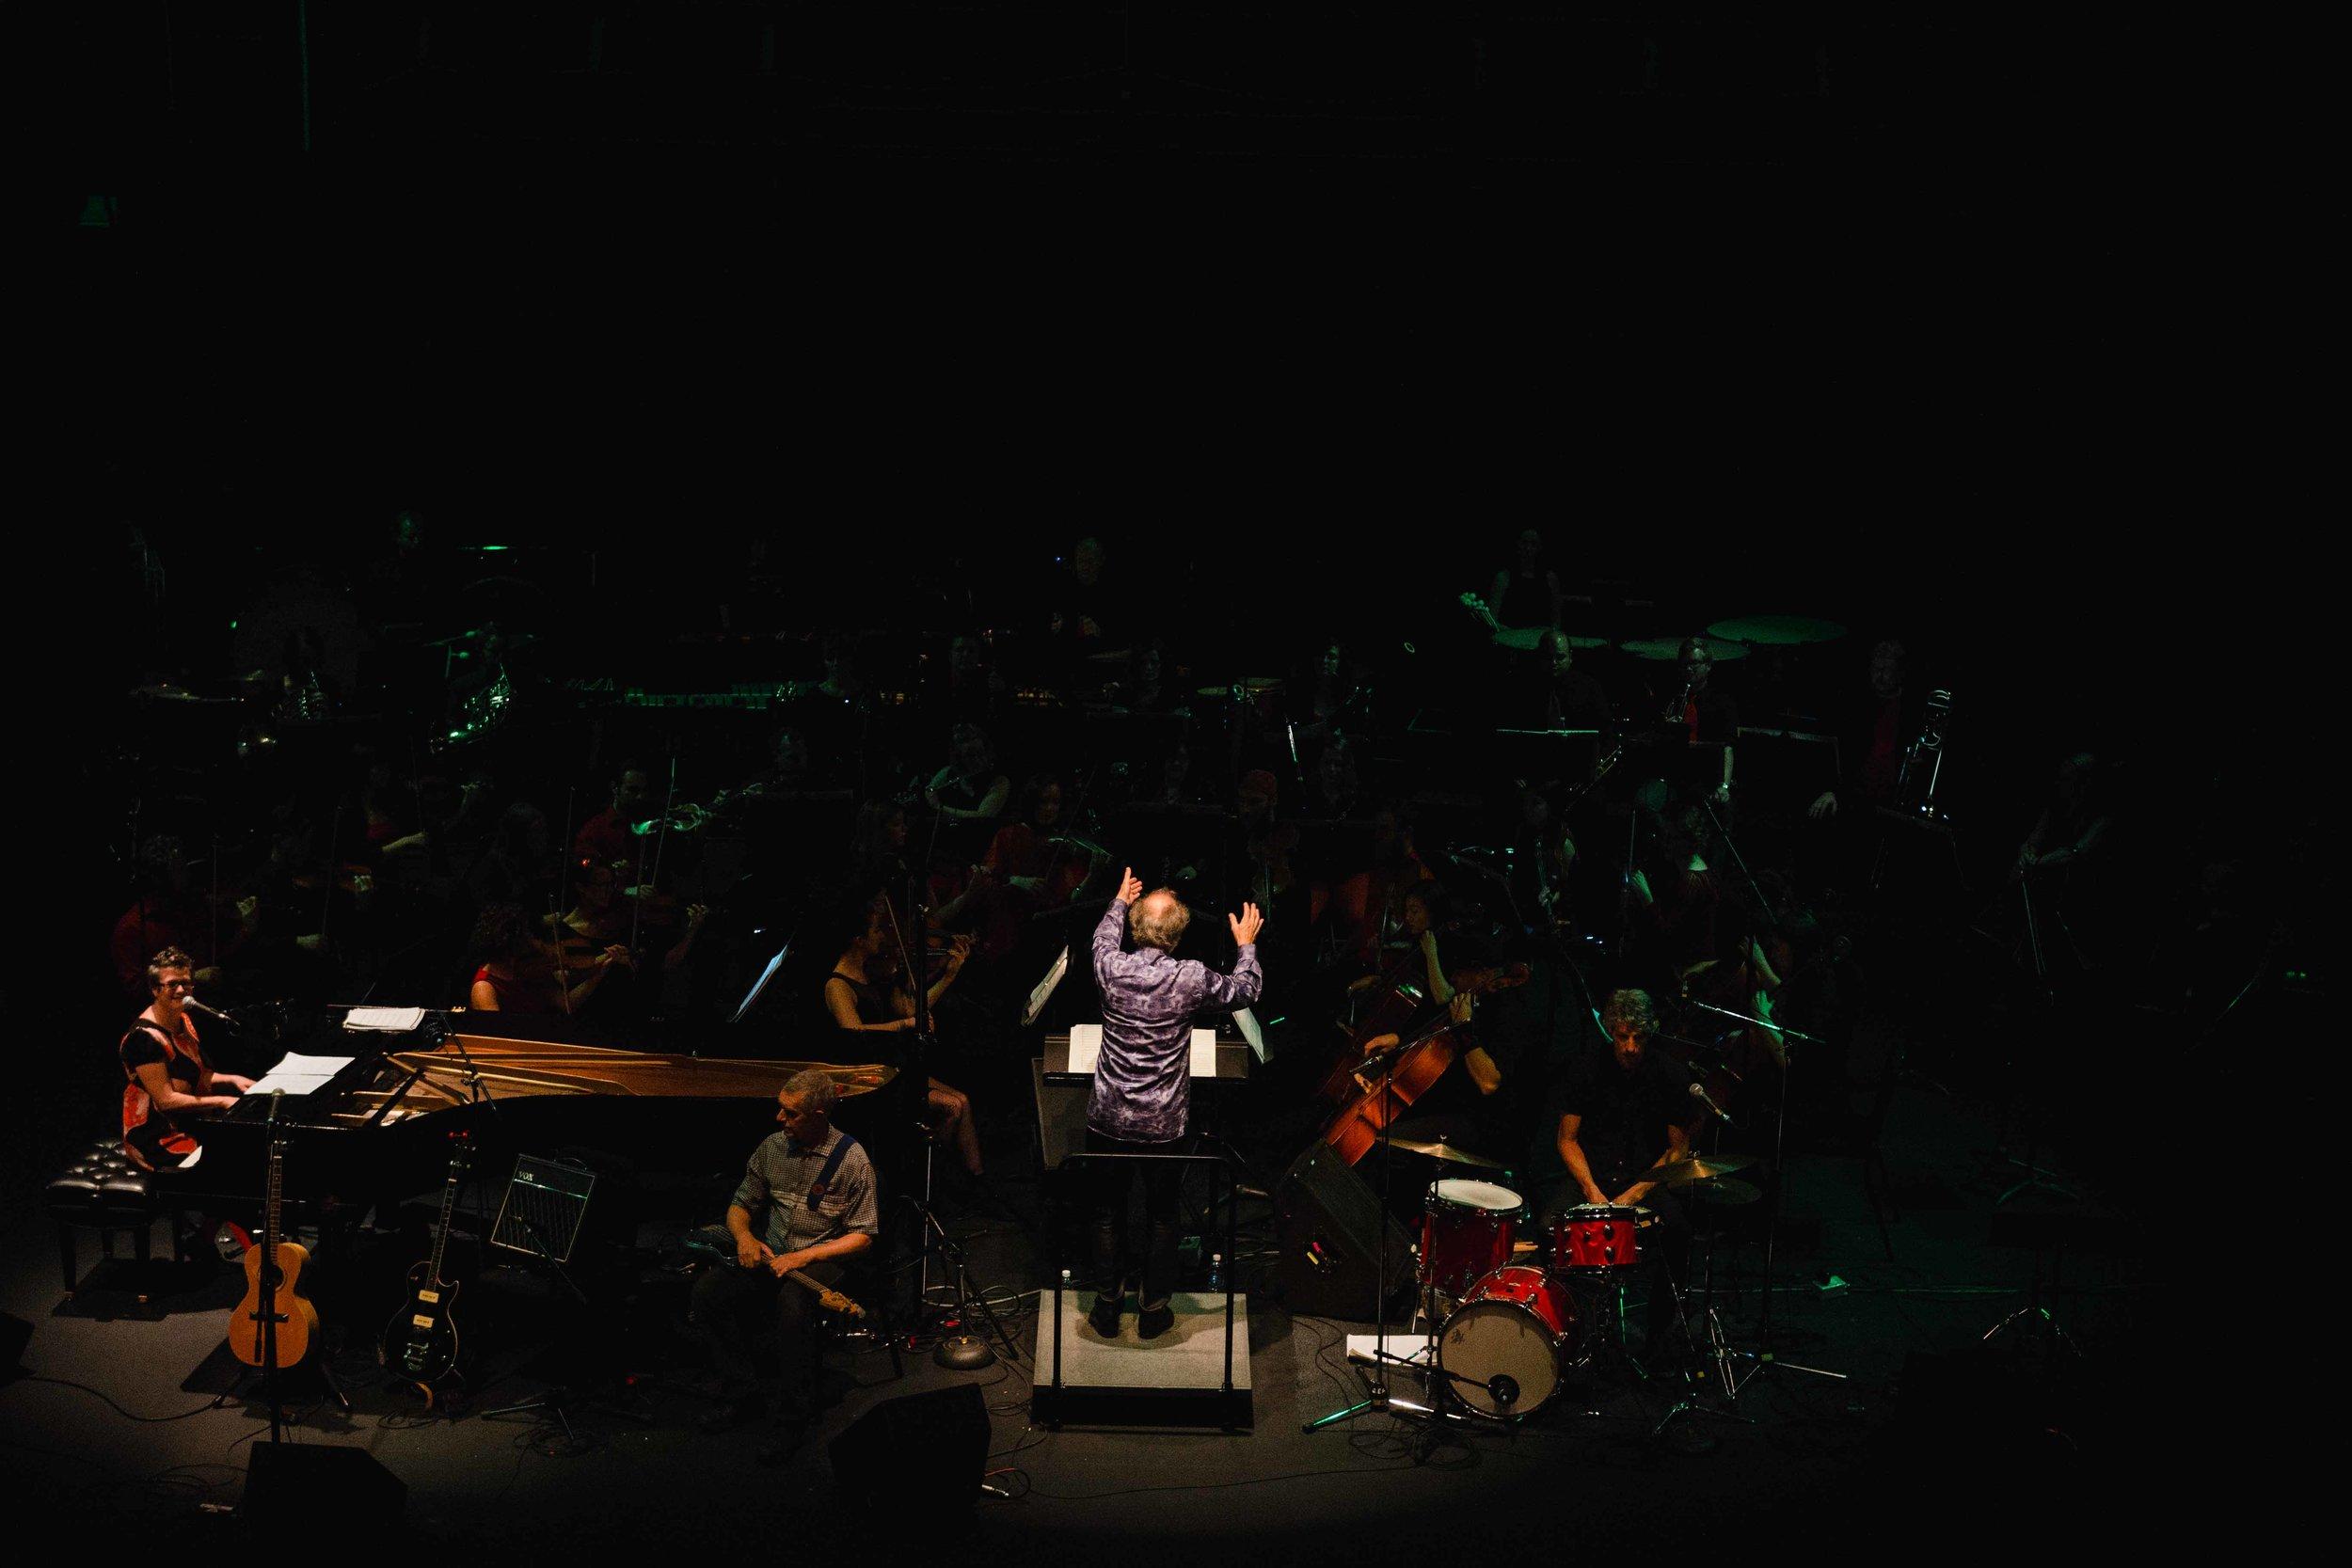 Saman-Shariati-Plastic-Acid-Orchestra-Veda-Hille-13.jpg